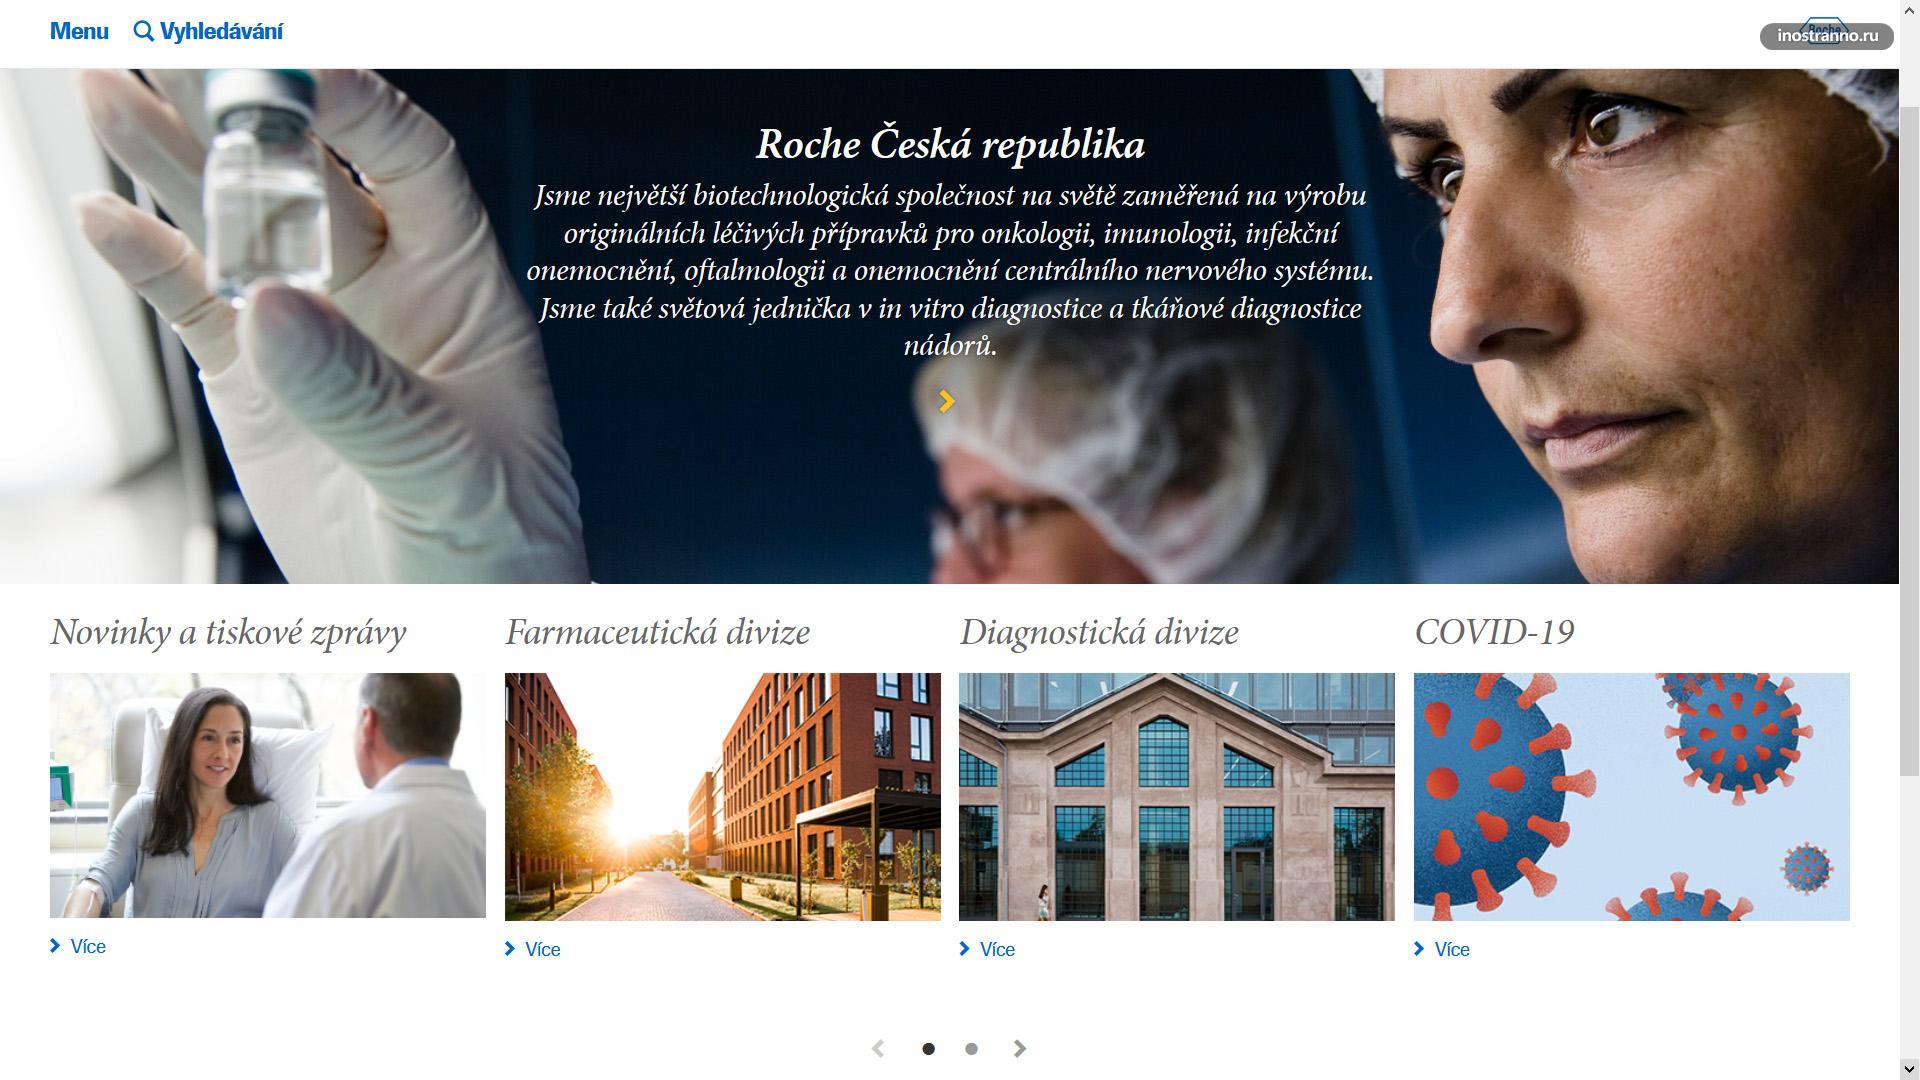 Roche крупнейшая фармацевтическая Европы